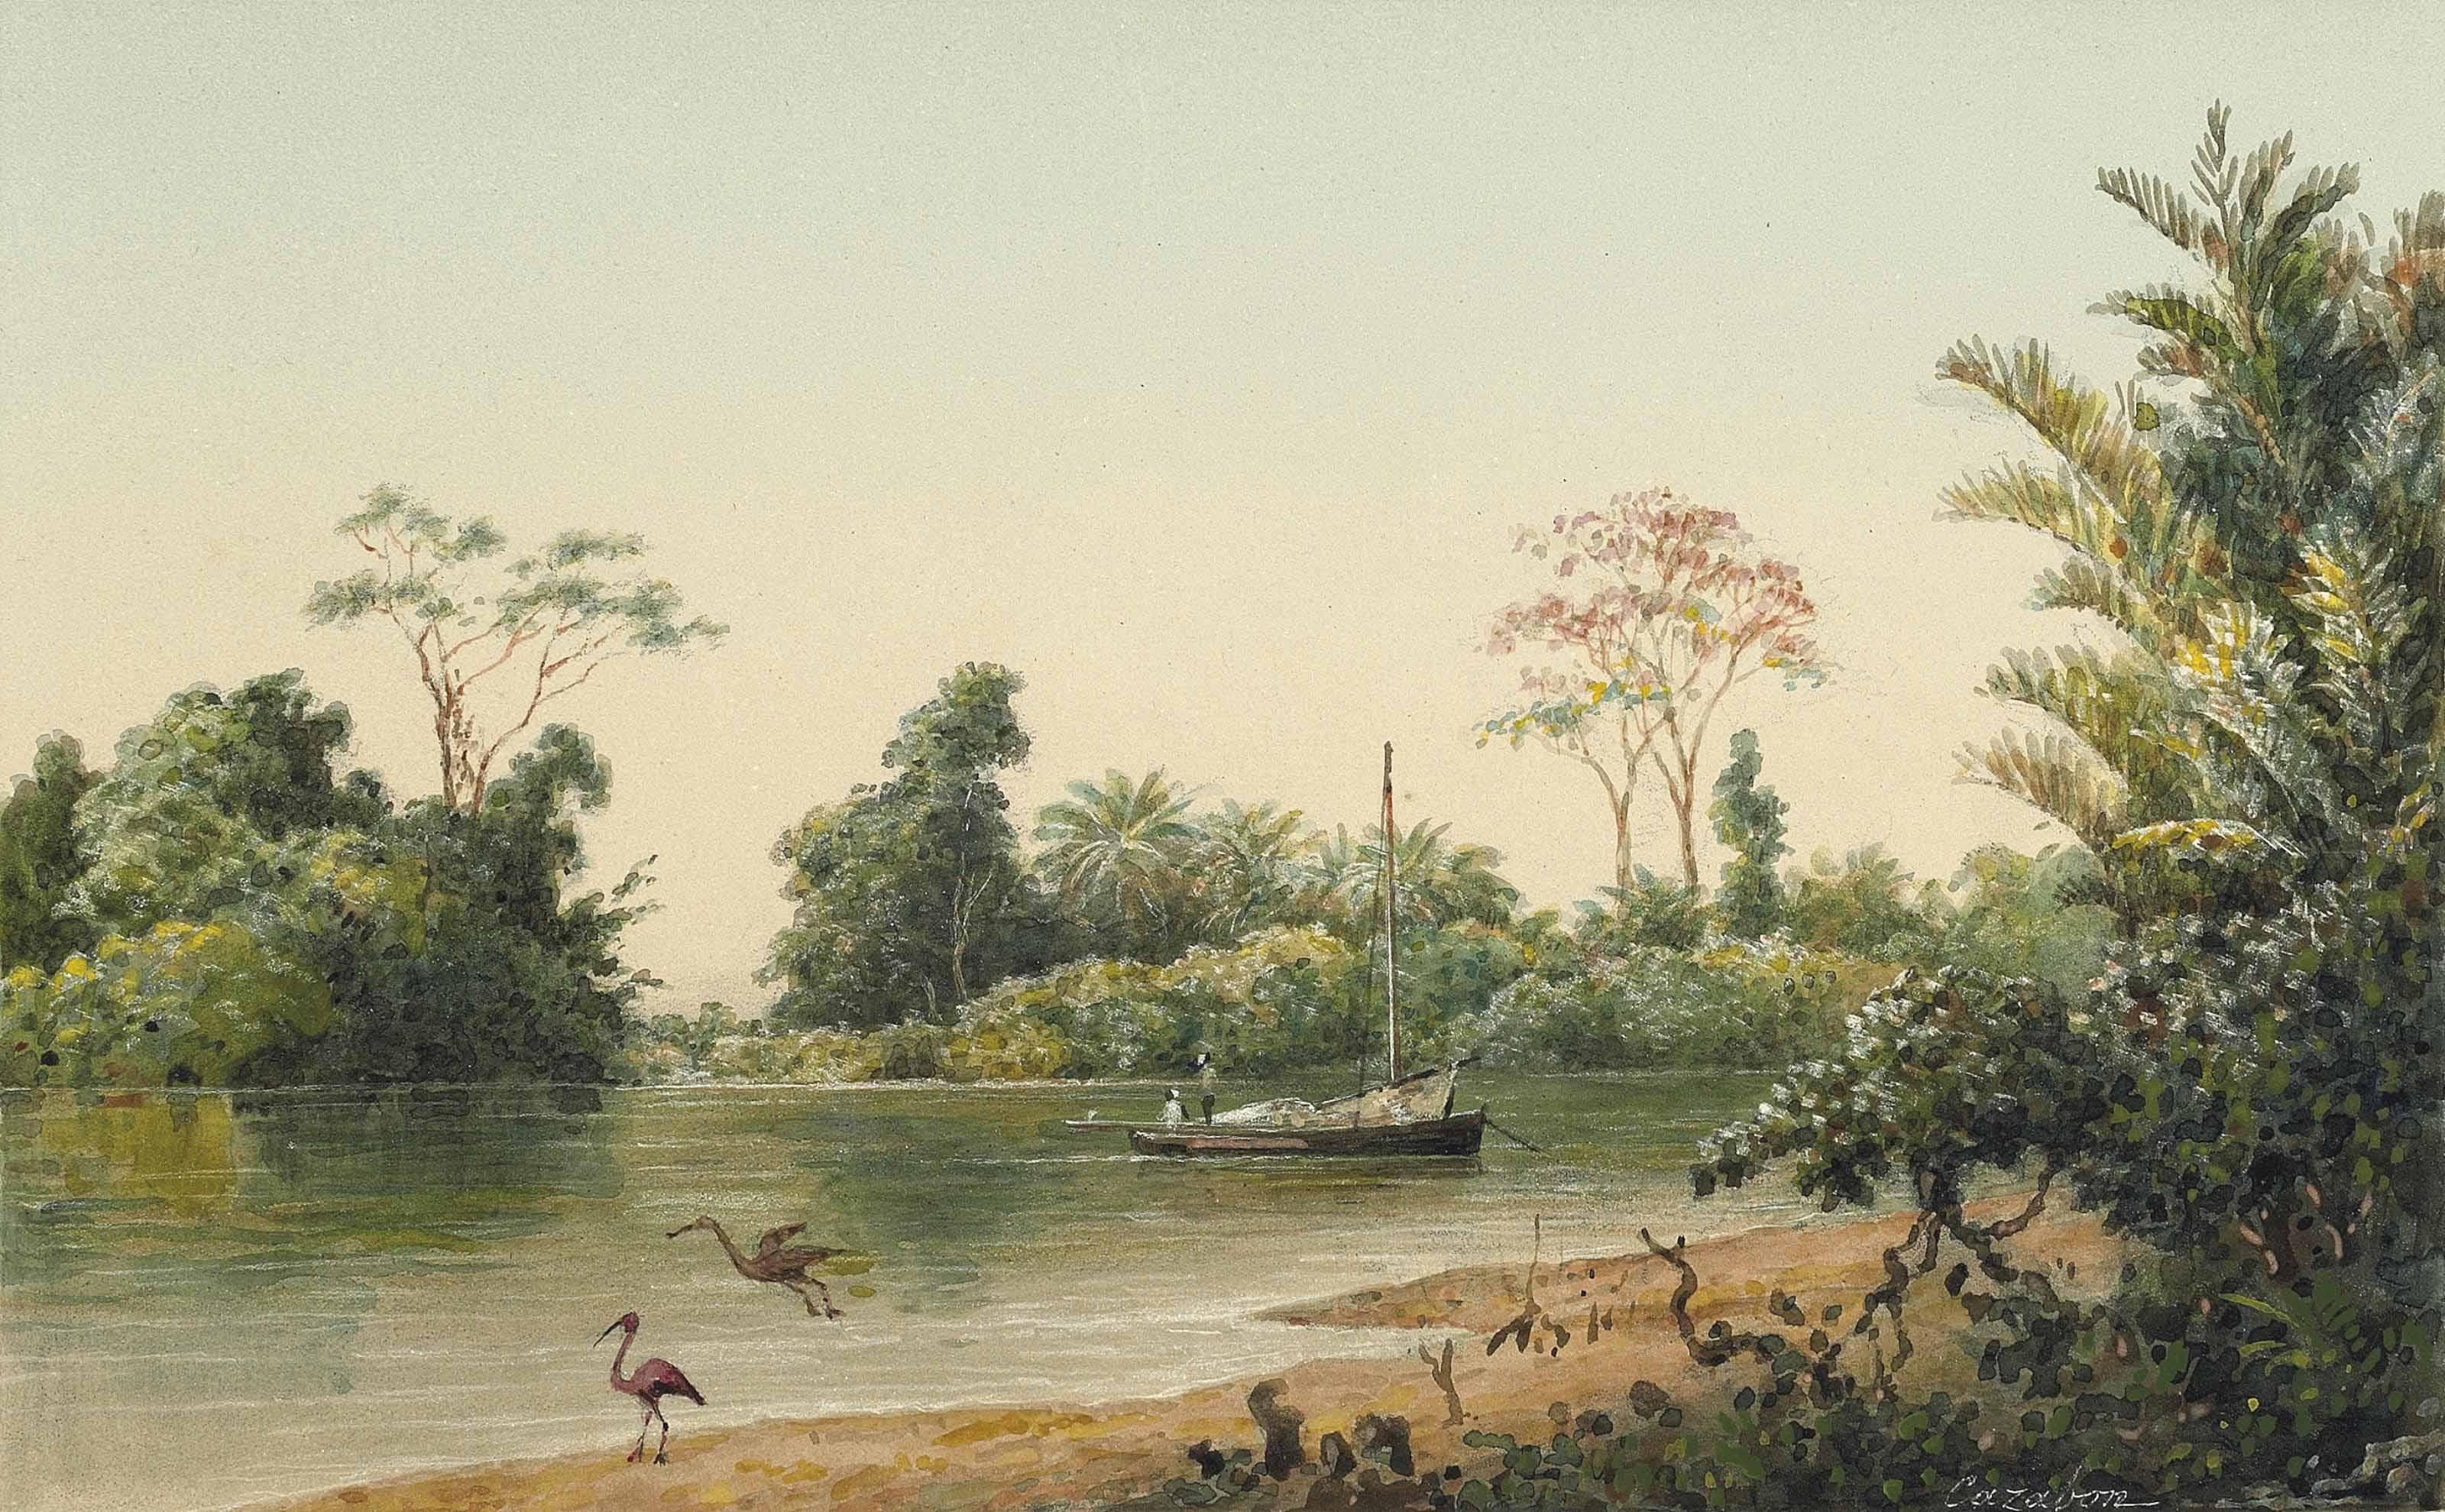 Caroni River, Trinidad